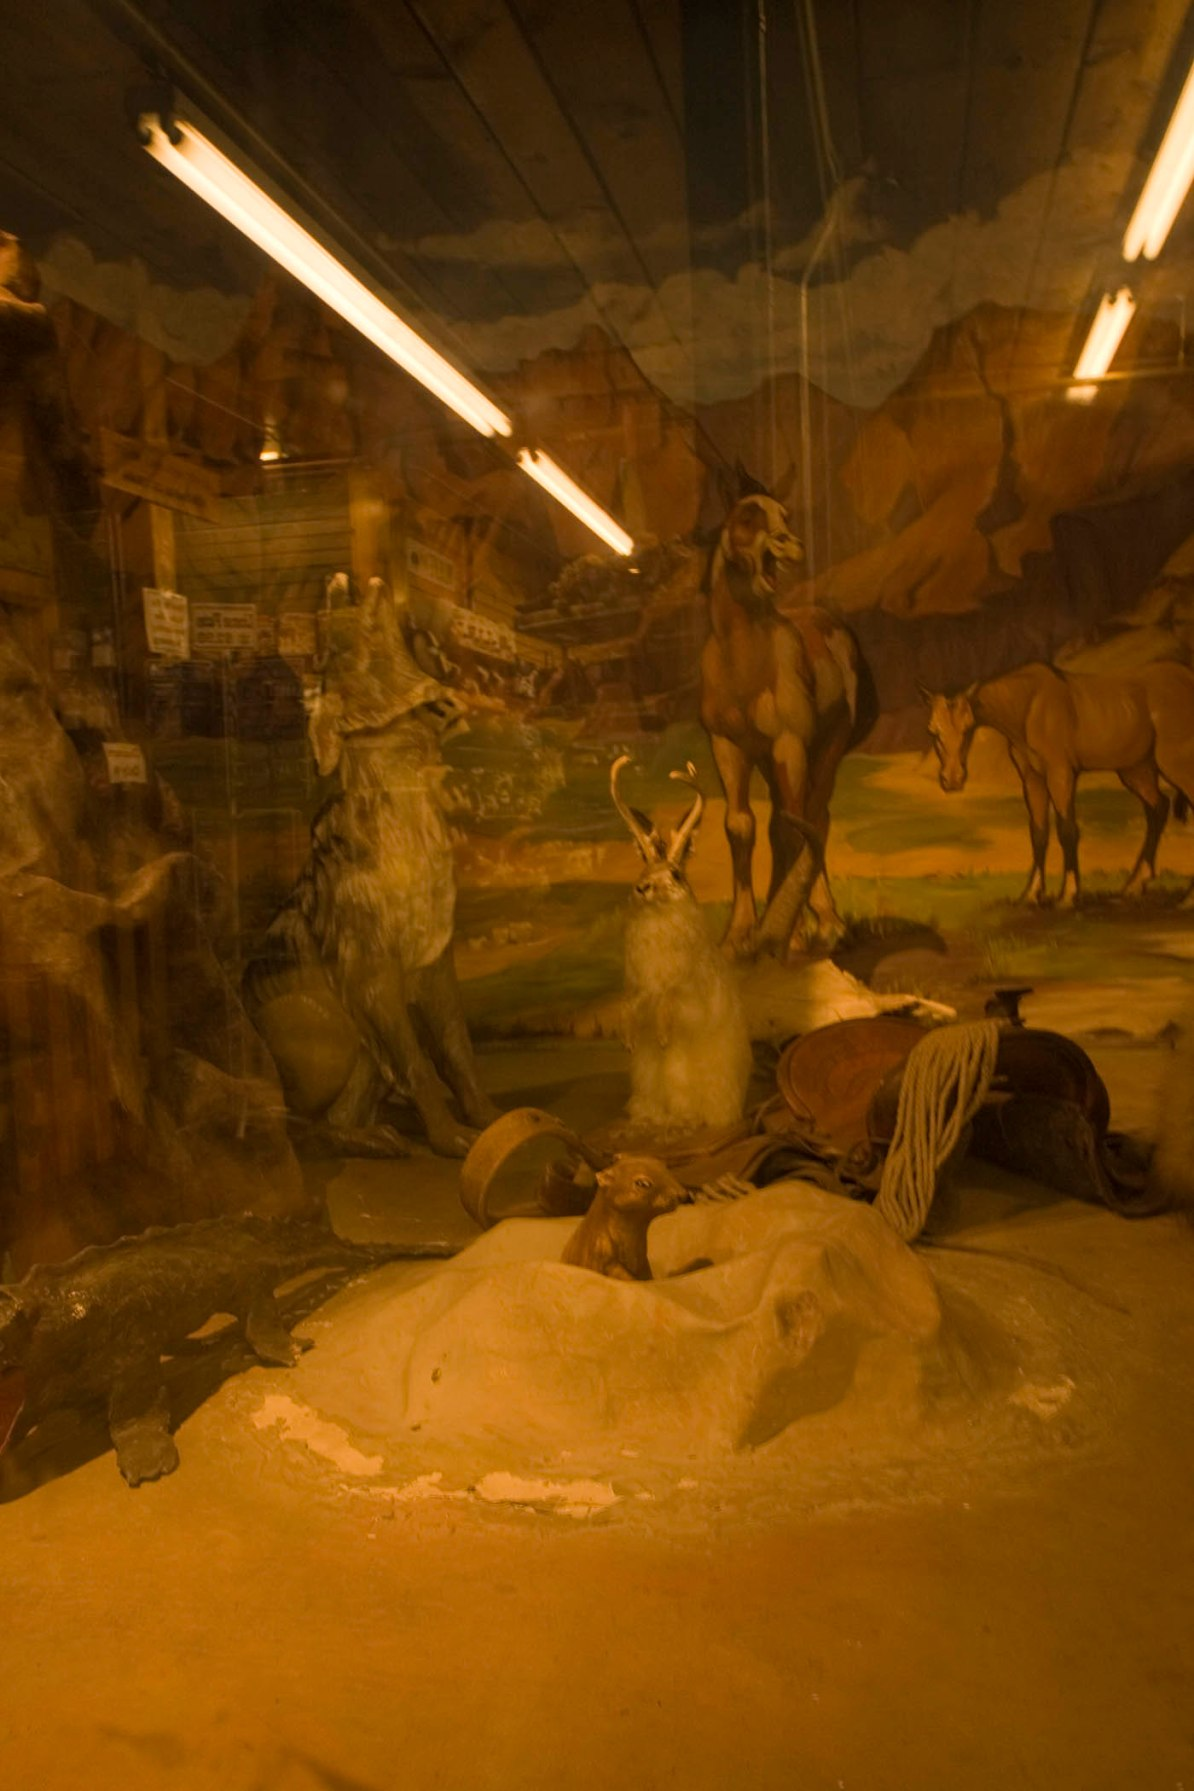 Wax Museum inside Wall Drug Store in Wall, South Dakota